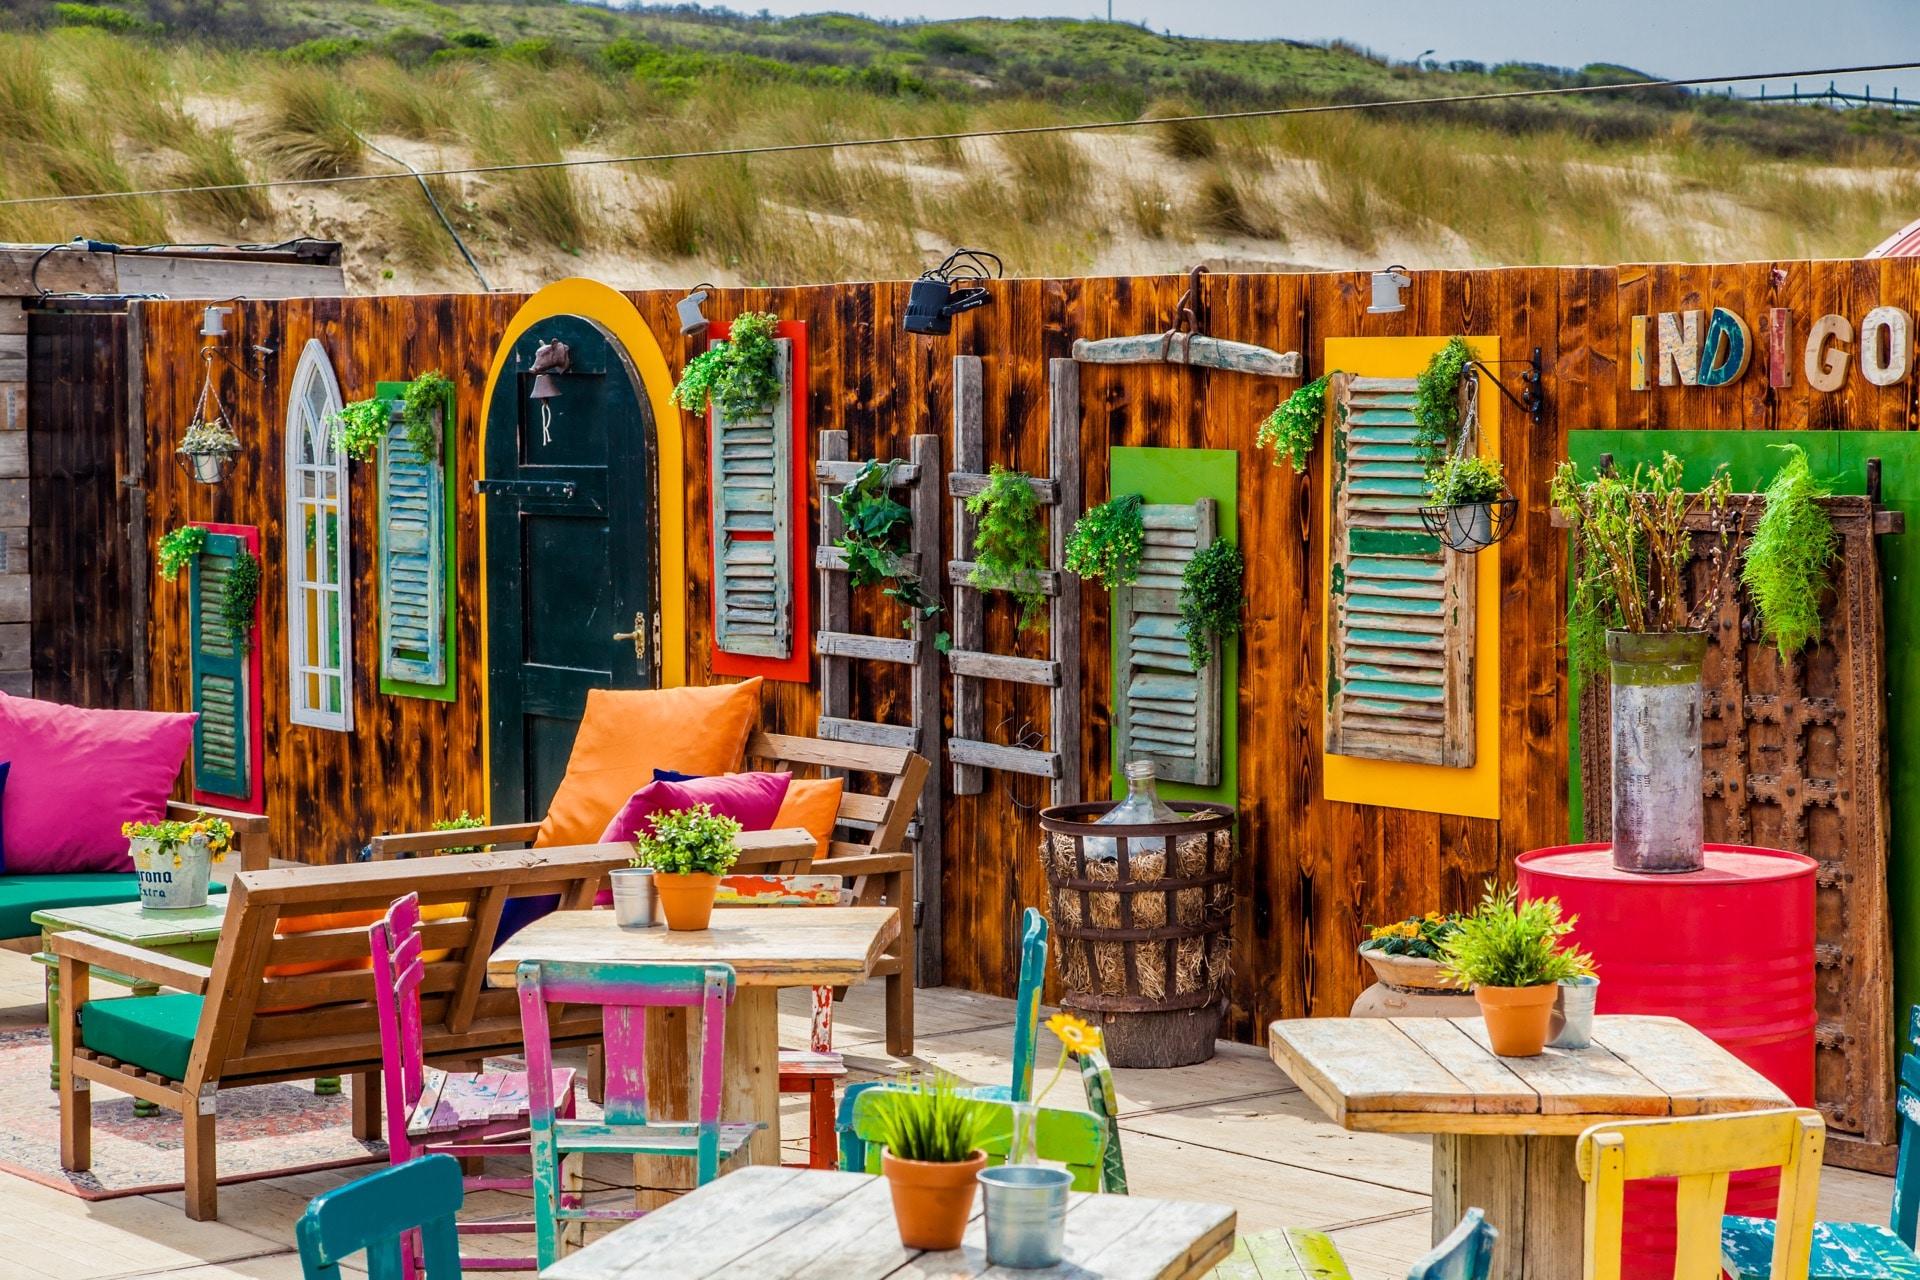 beachclub Indigo Eén bedrijfsuitje, 50 personen